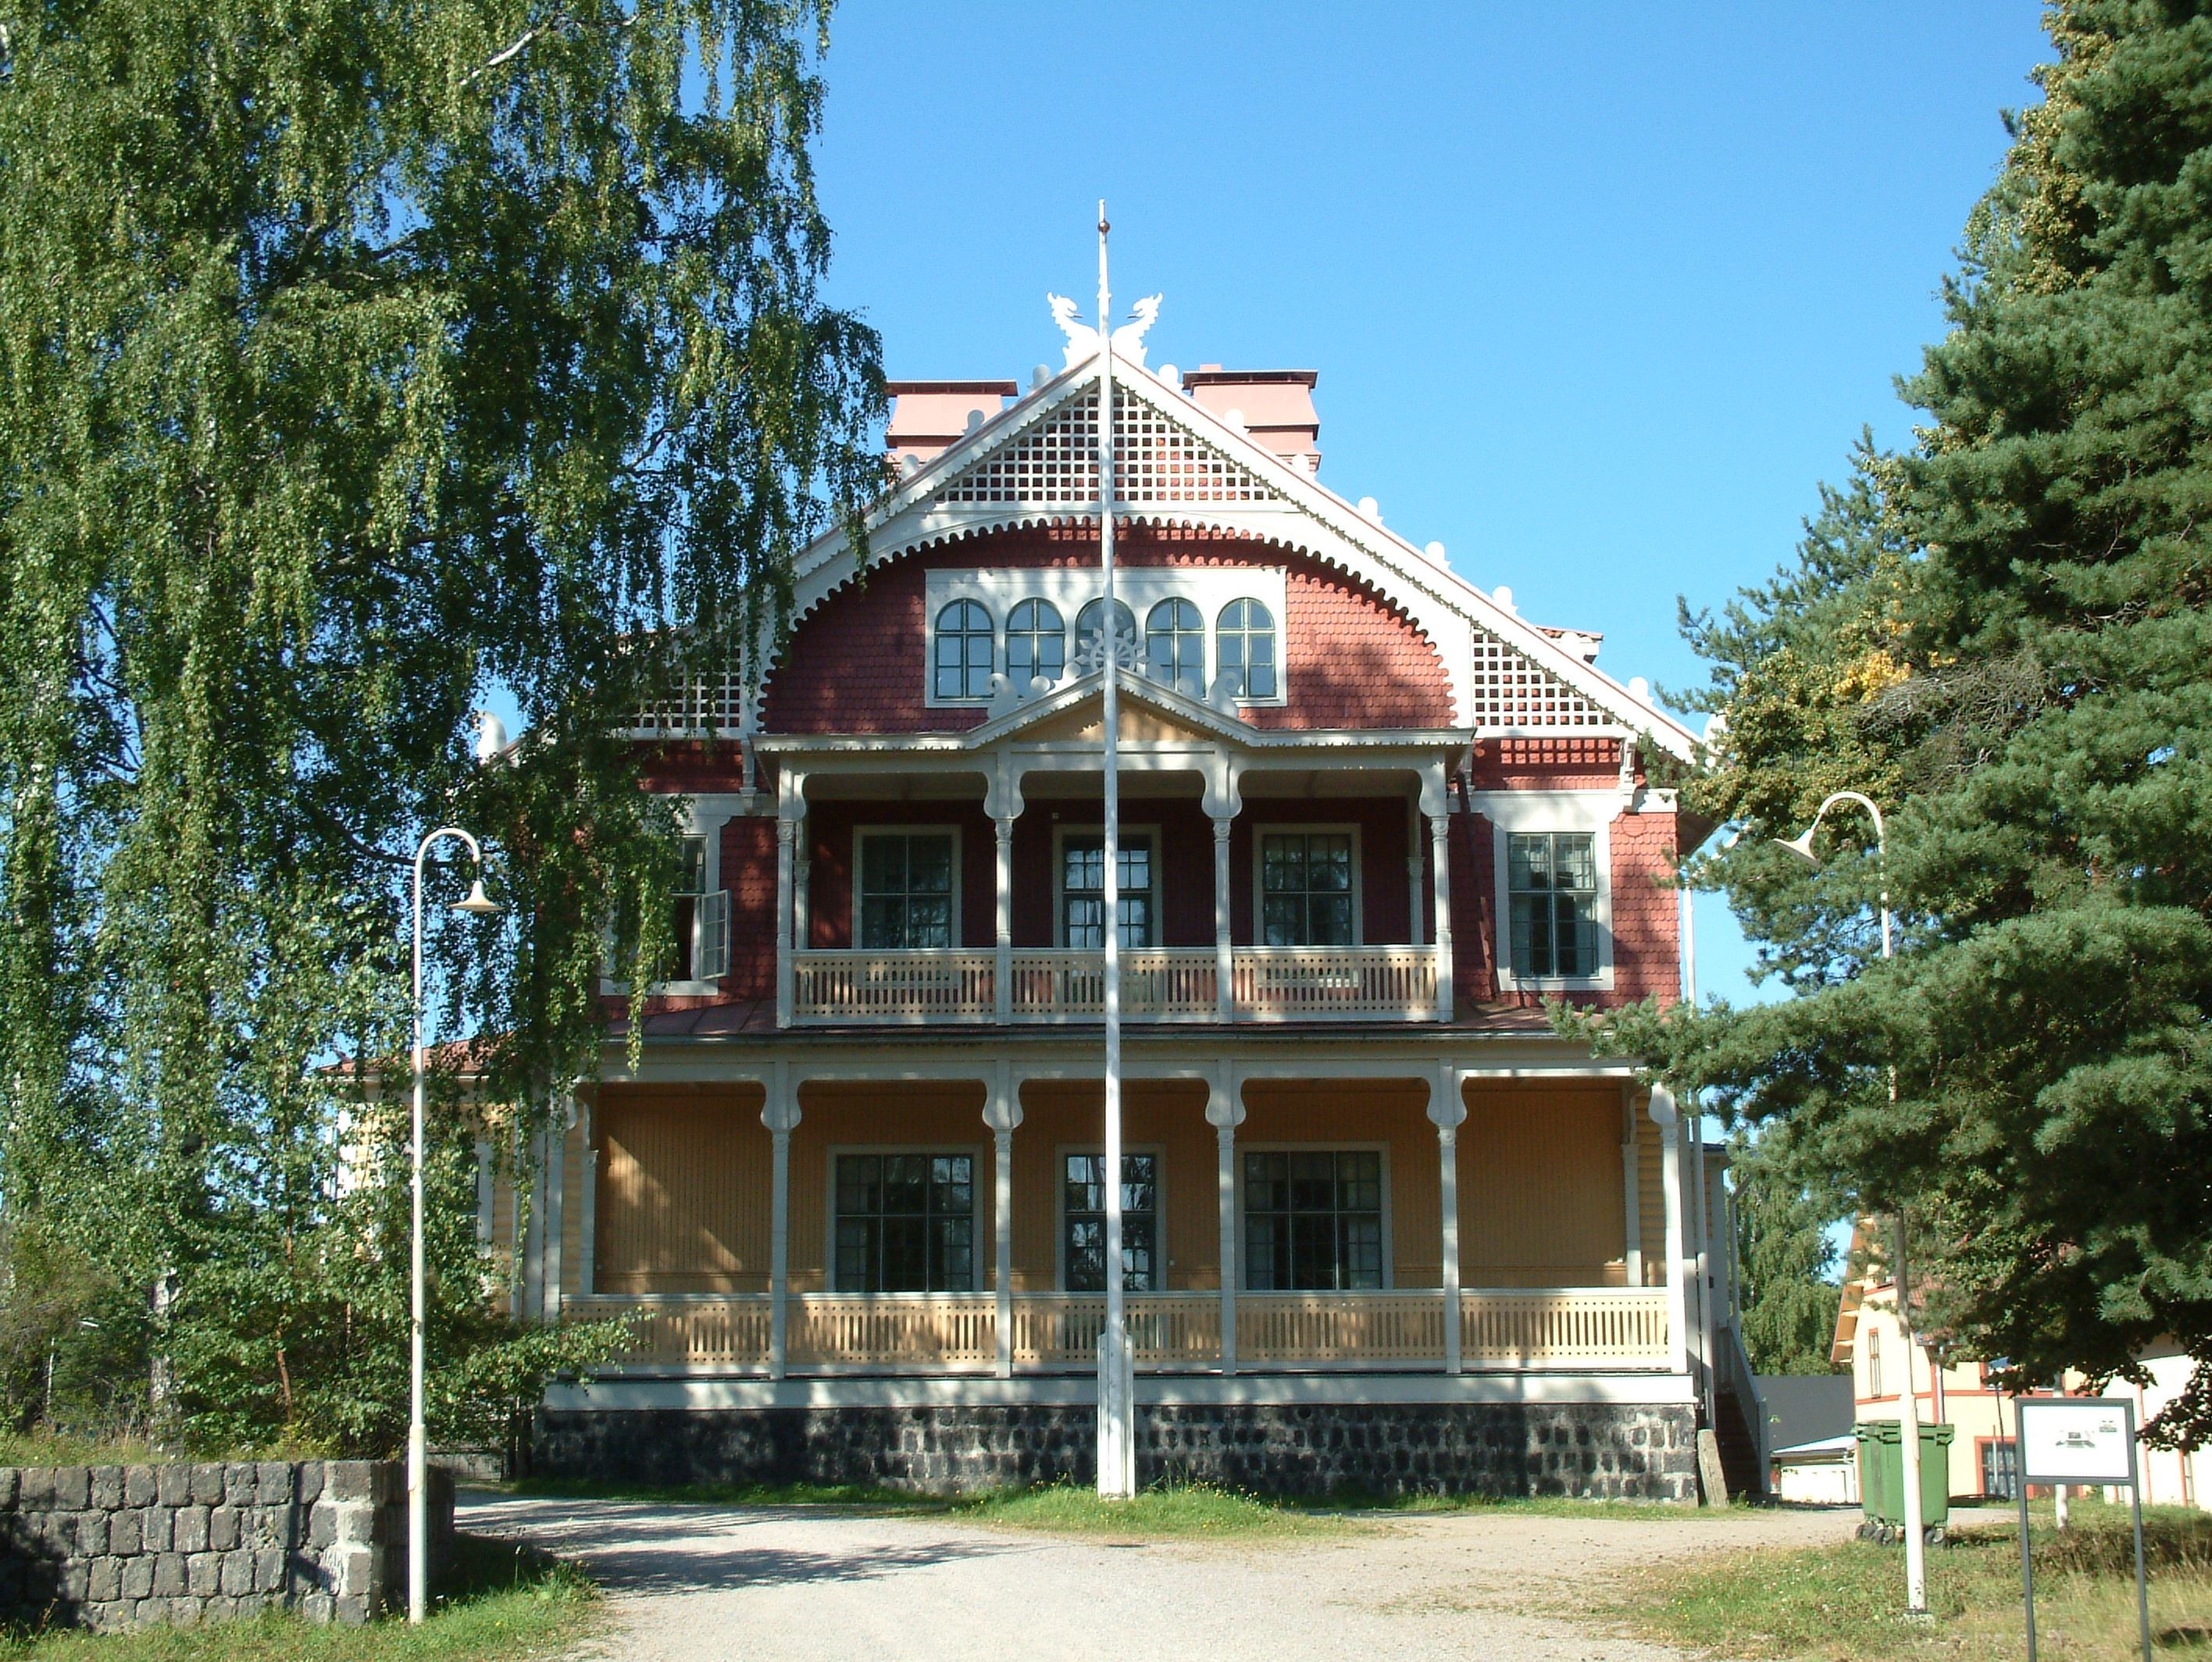 Öppet hus på Valhalla